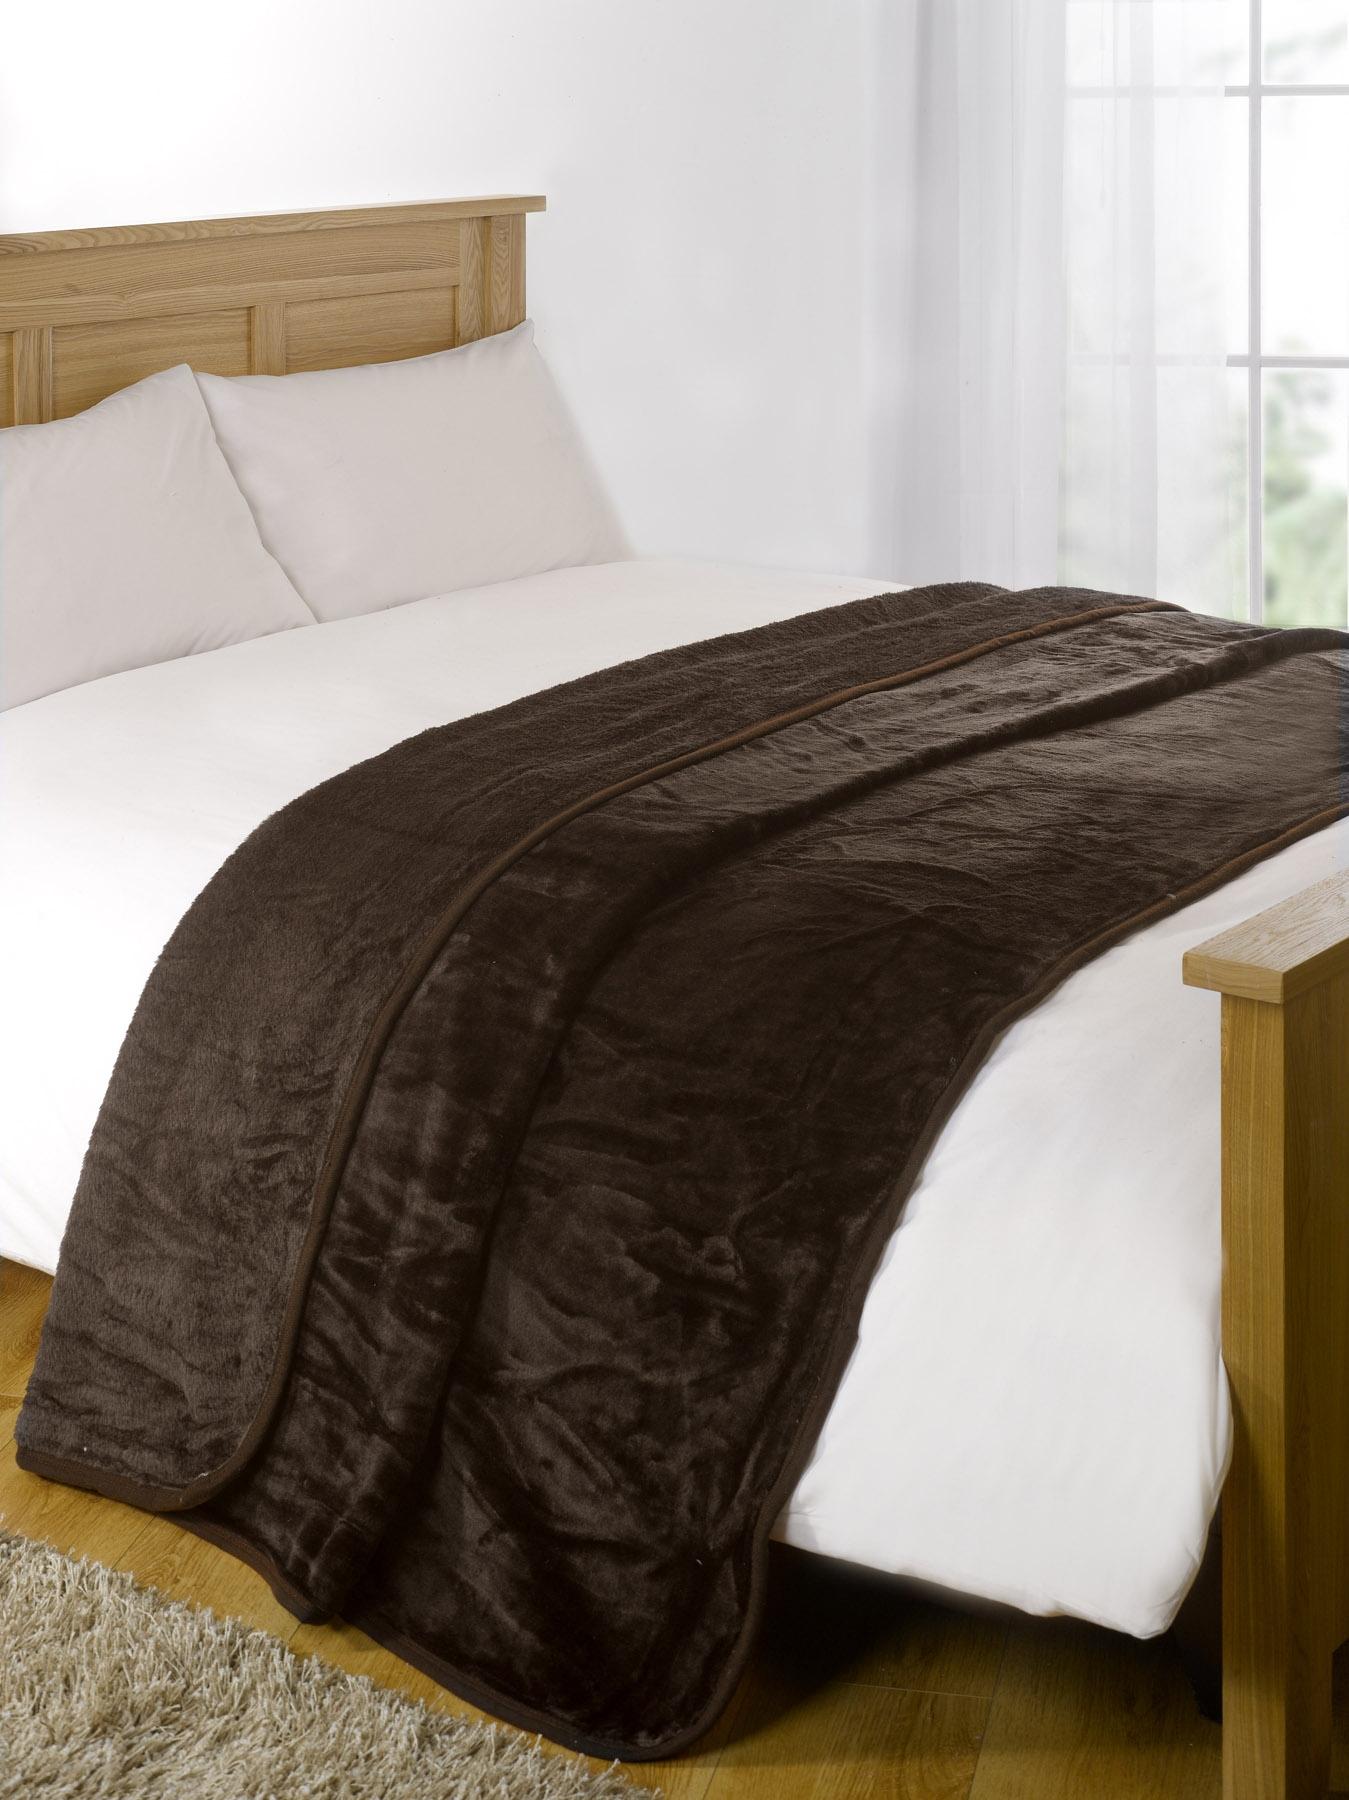 King Size Bed Blanket